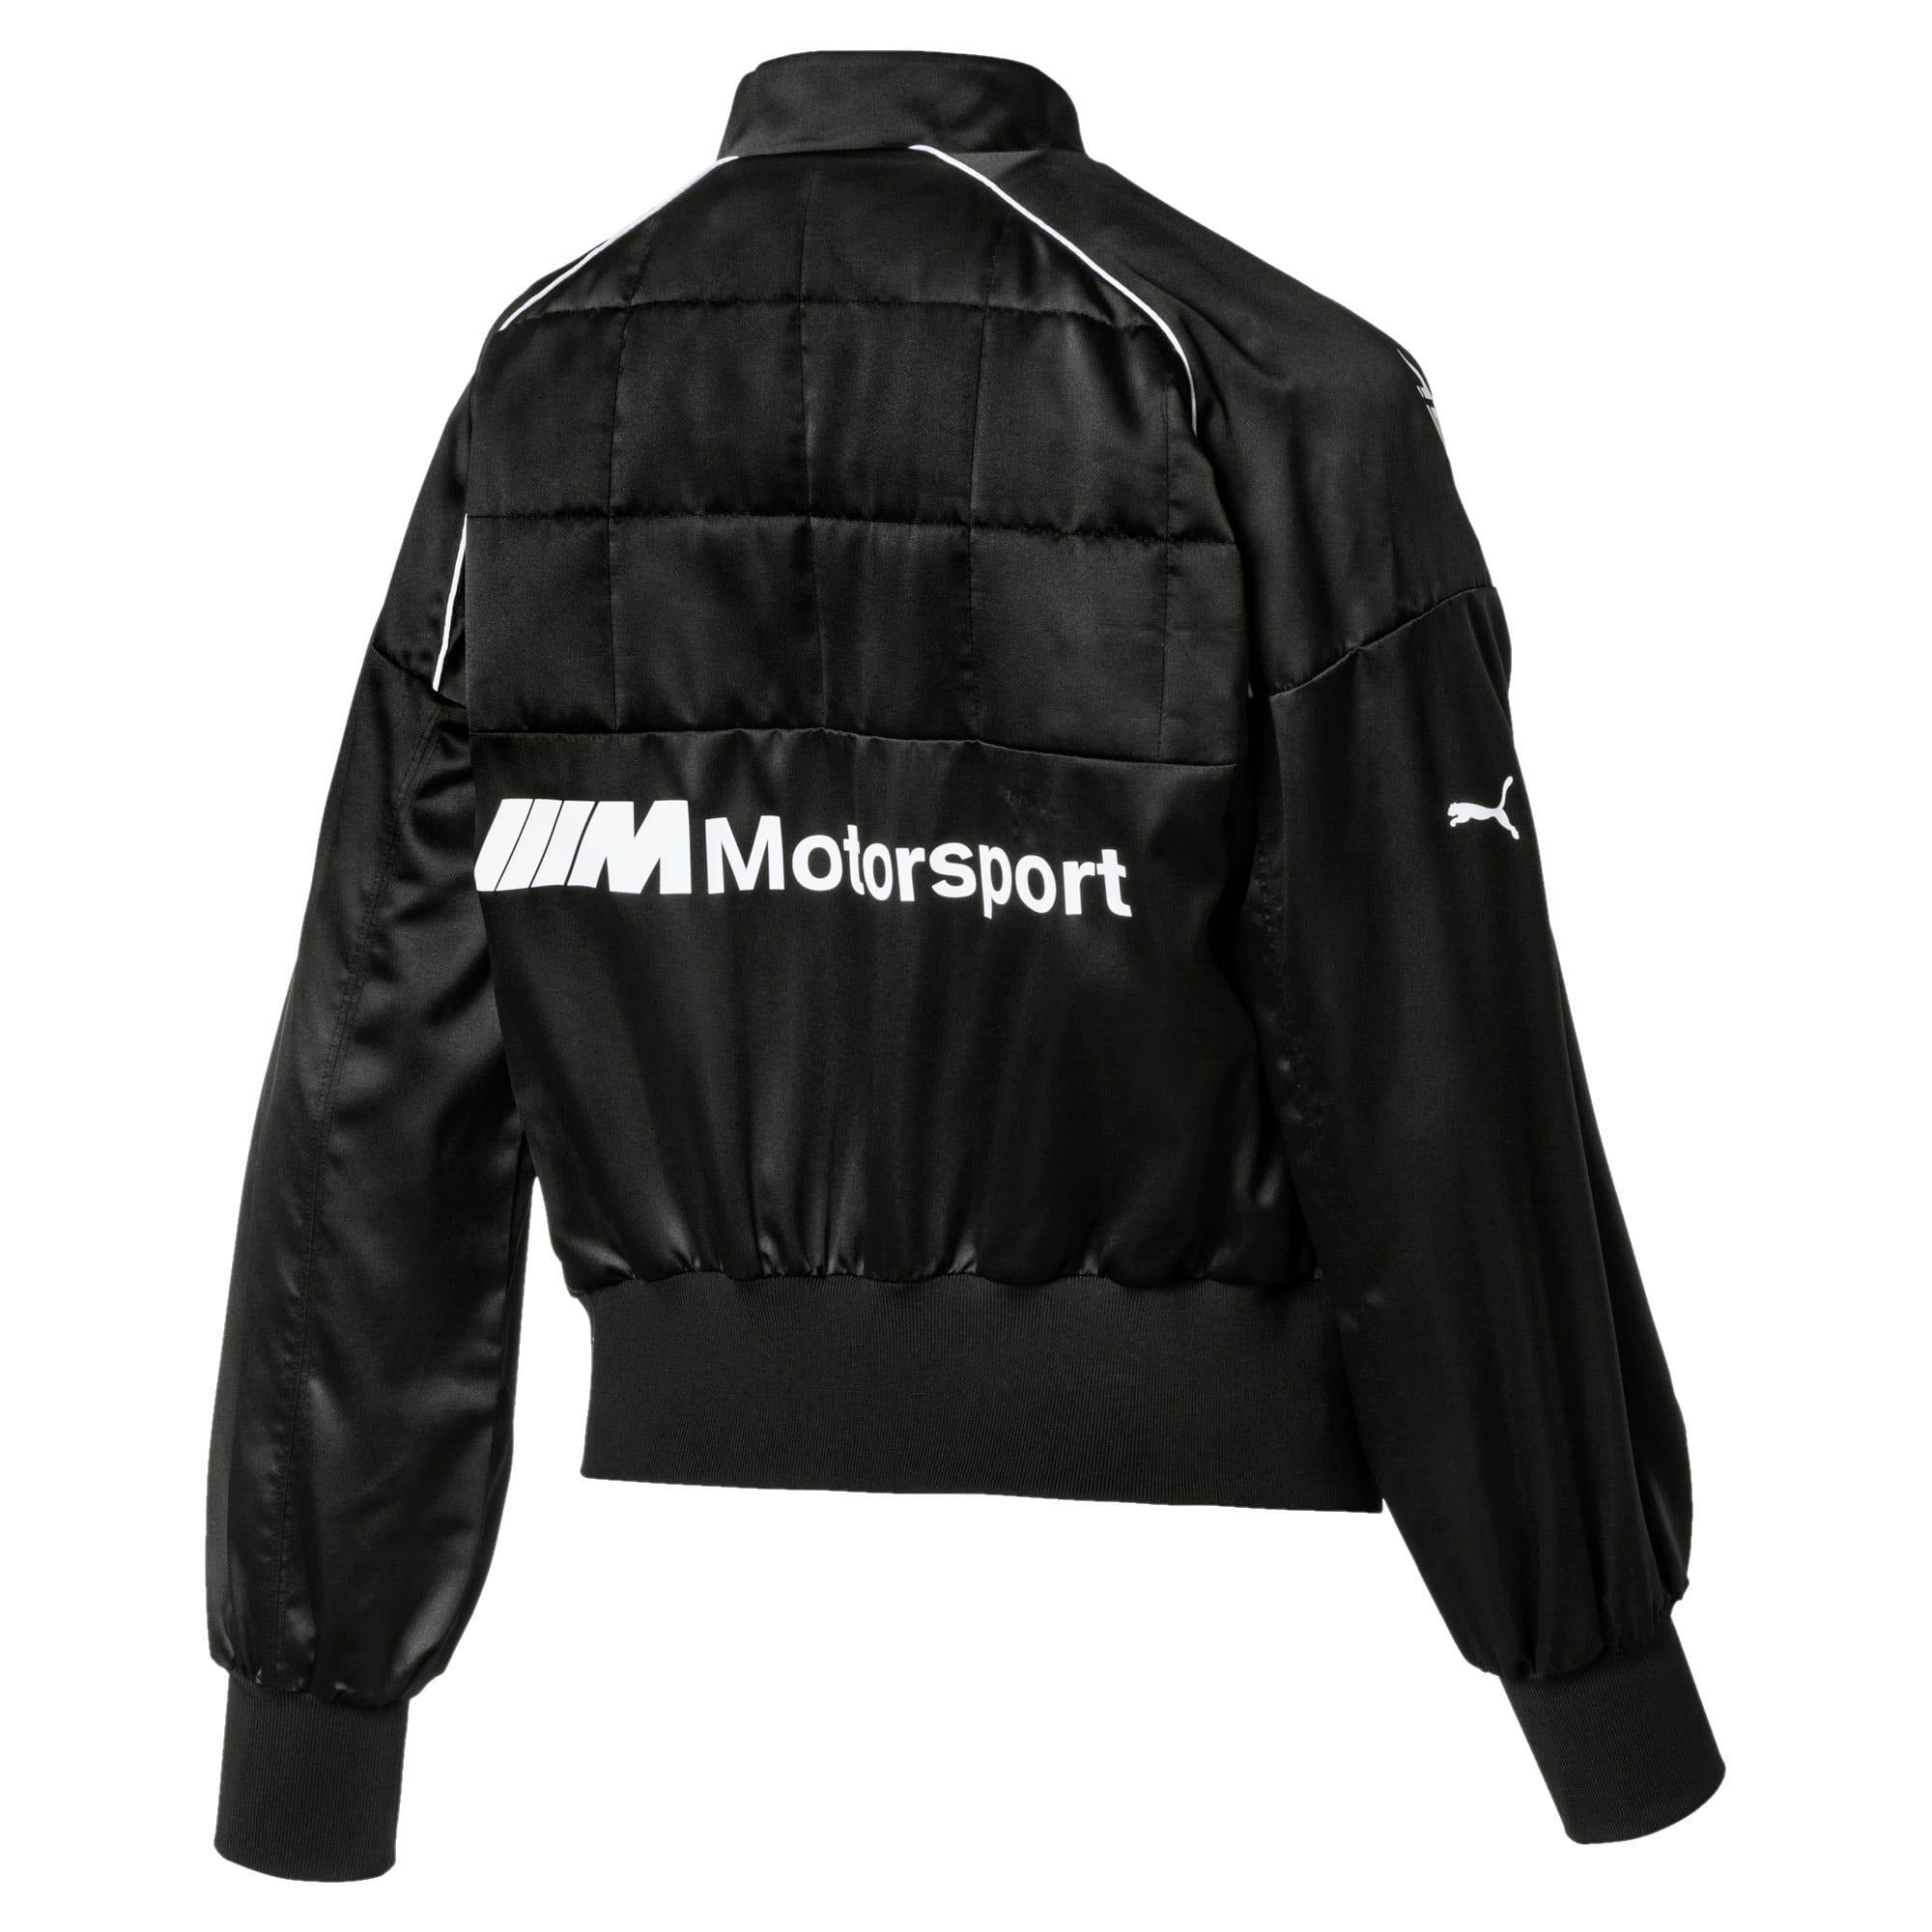 Thumbnail 2 of BMW M Motorsport Street Women's Jacket, Puma Black, medium